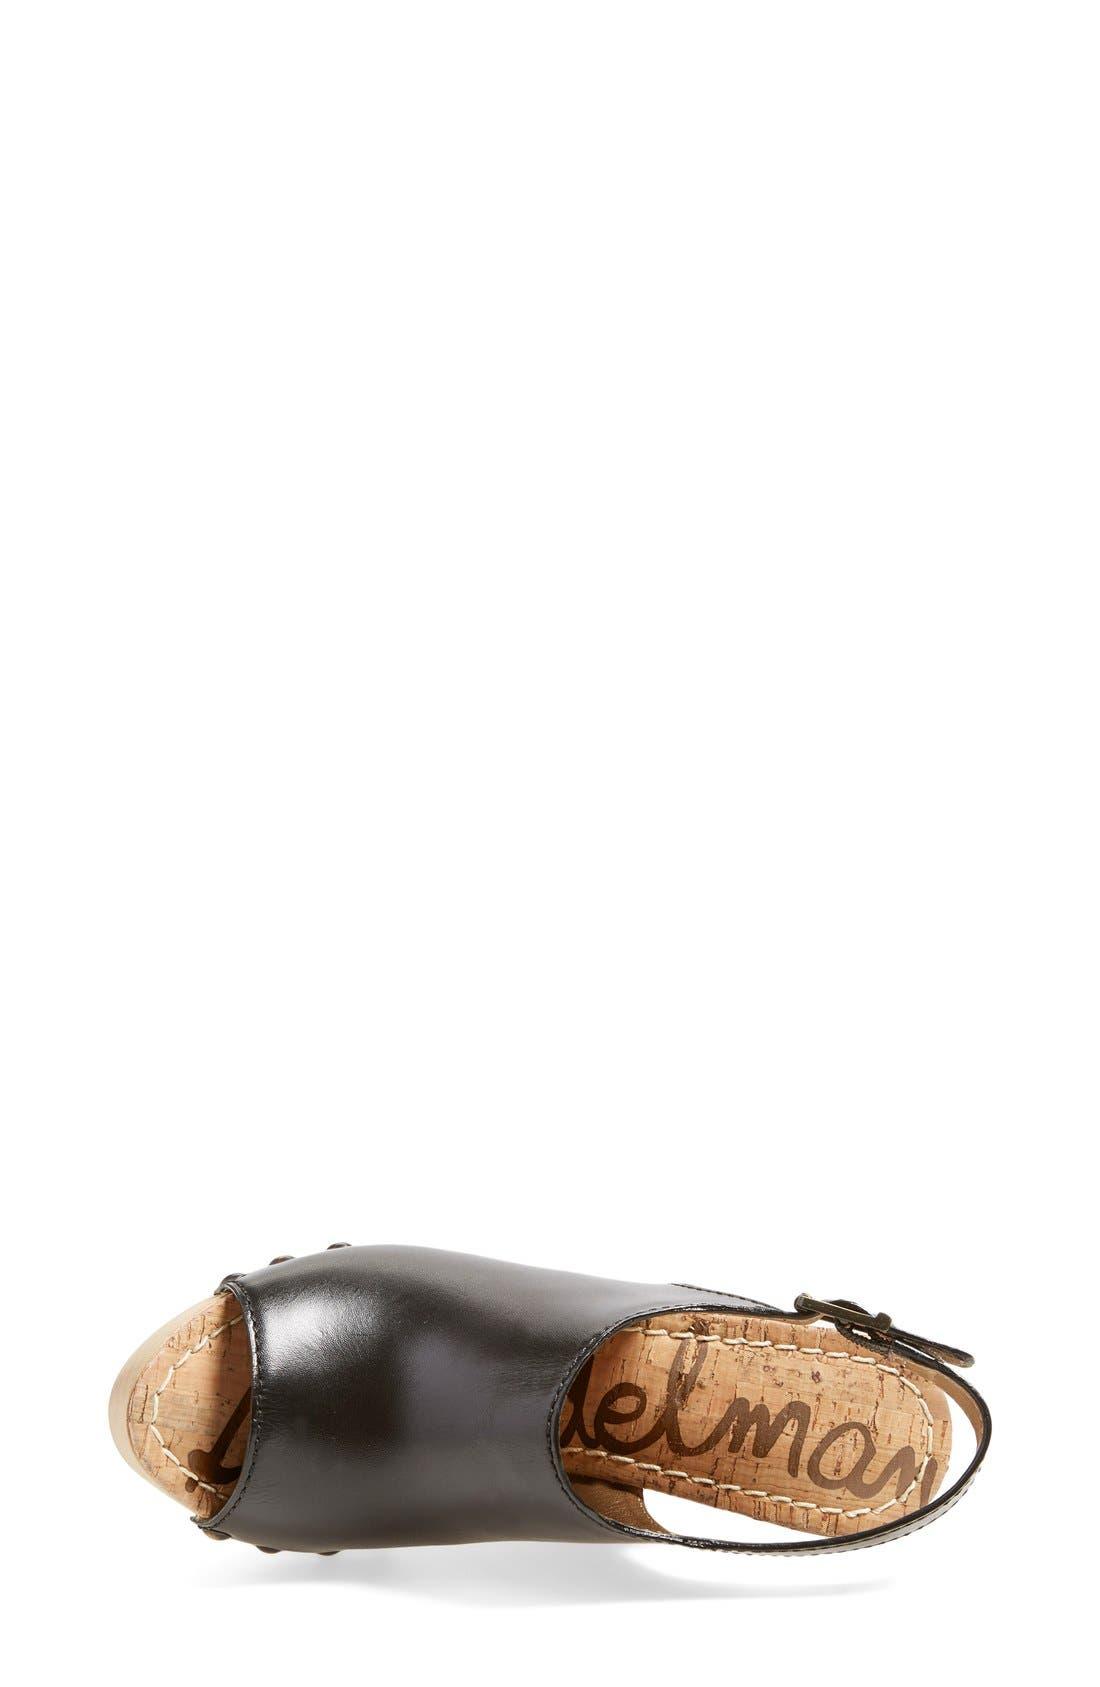 Alternate Image 3  - Sam Edelman'Camilla' Wedge Sandal (Women)